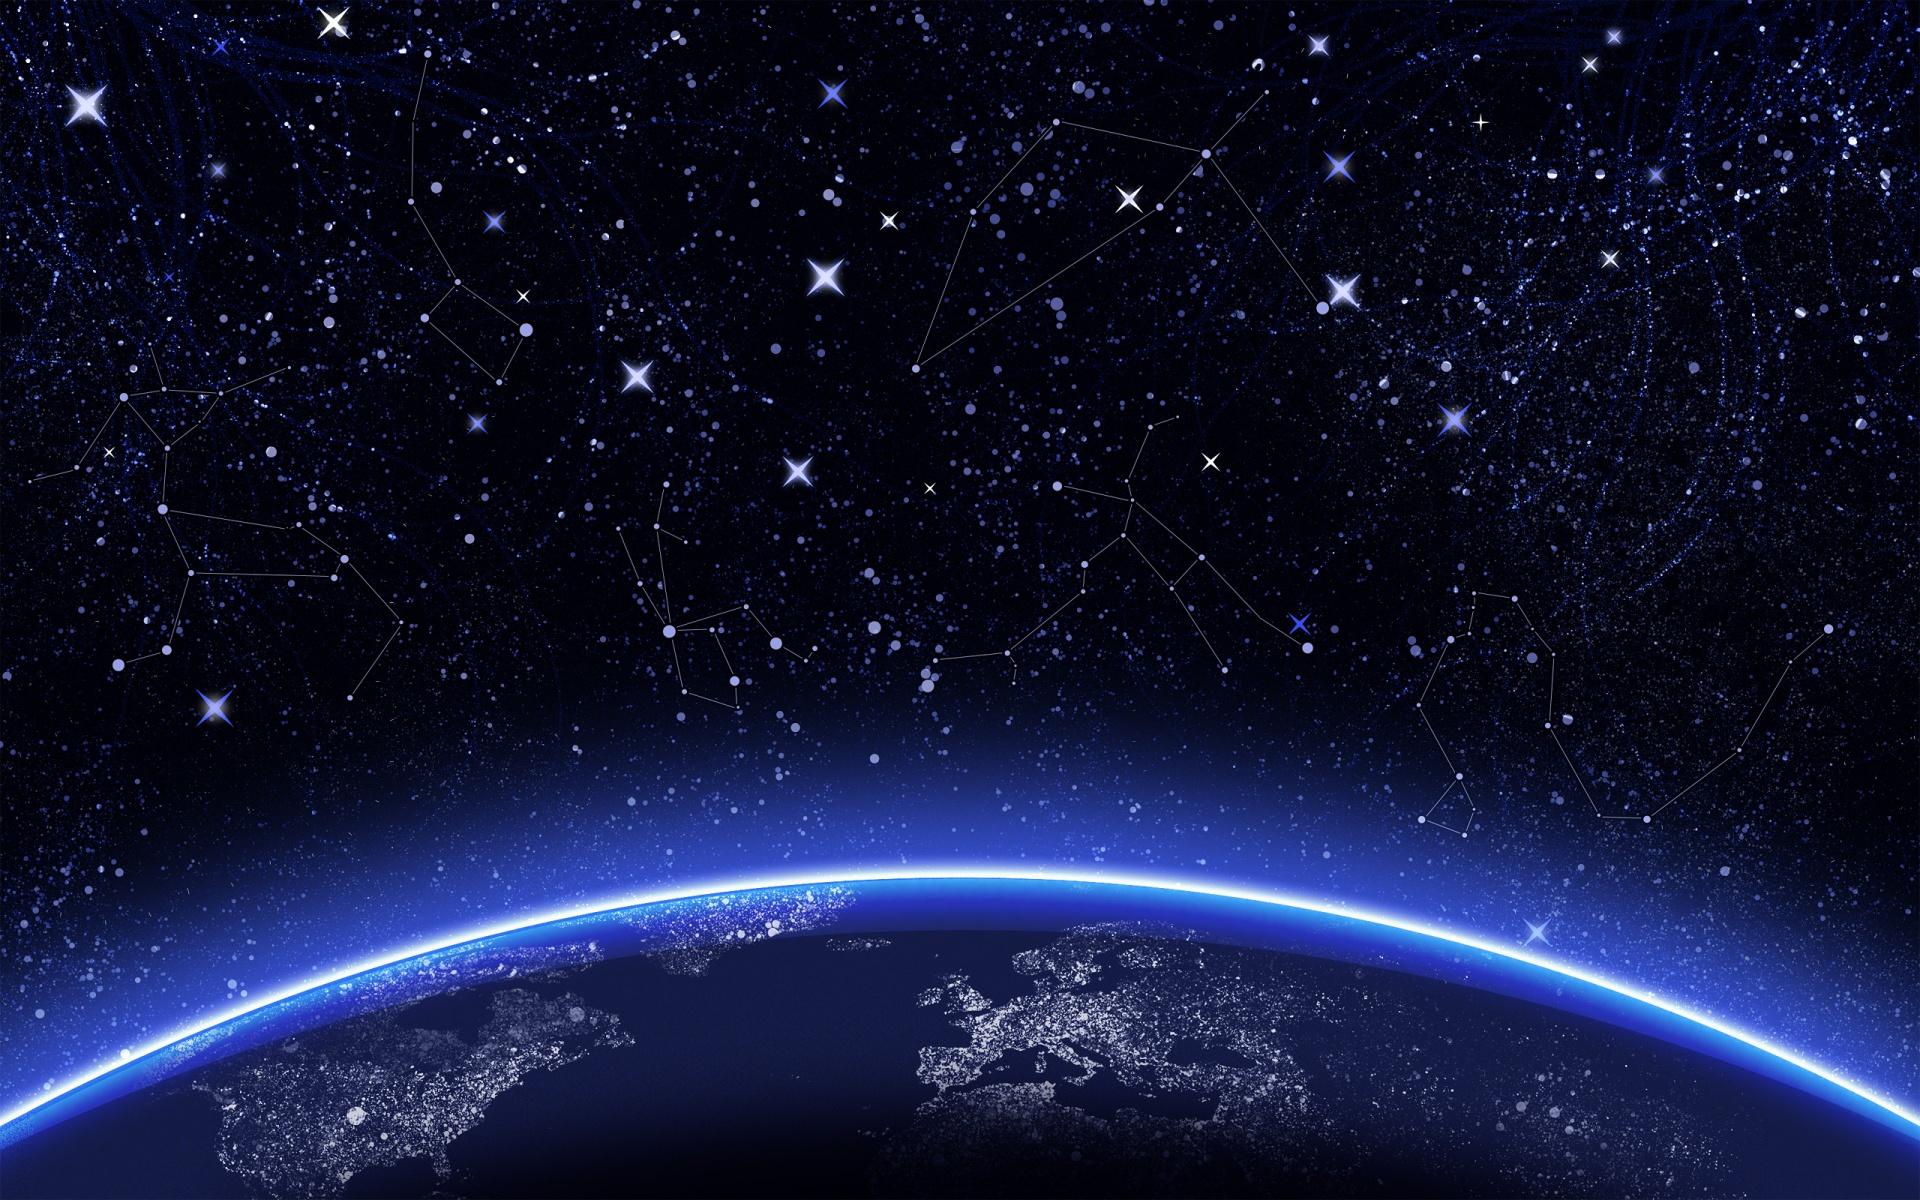 Night Background 28055 1440x900 px